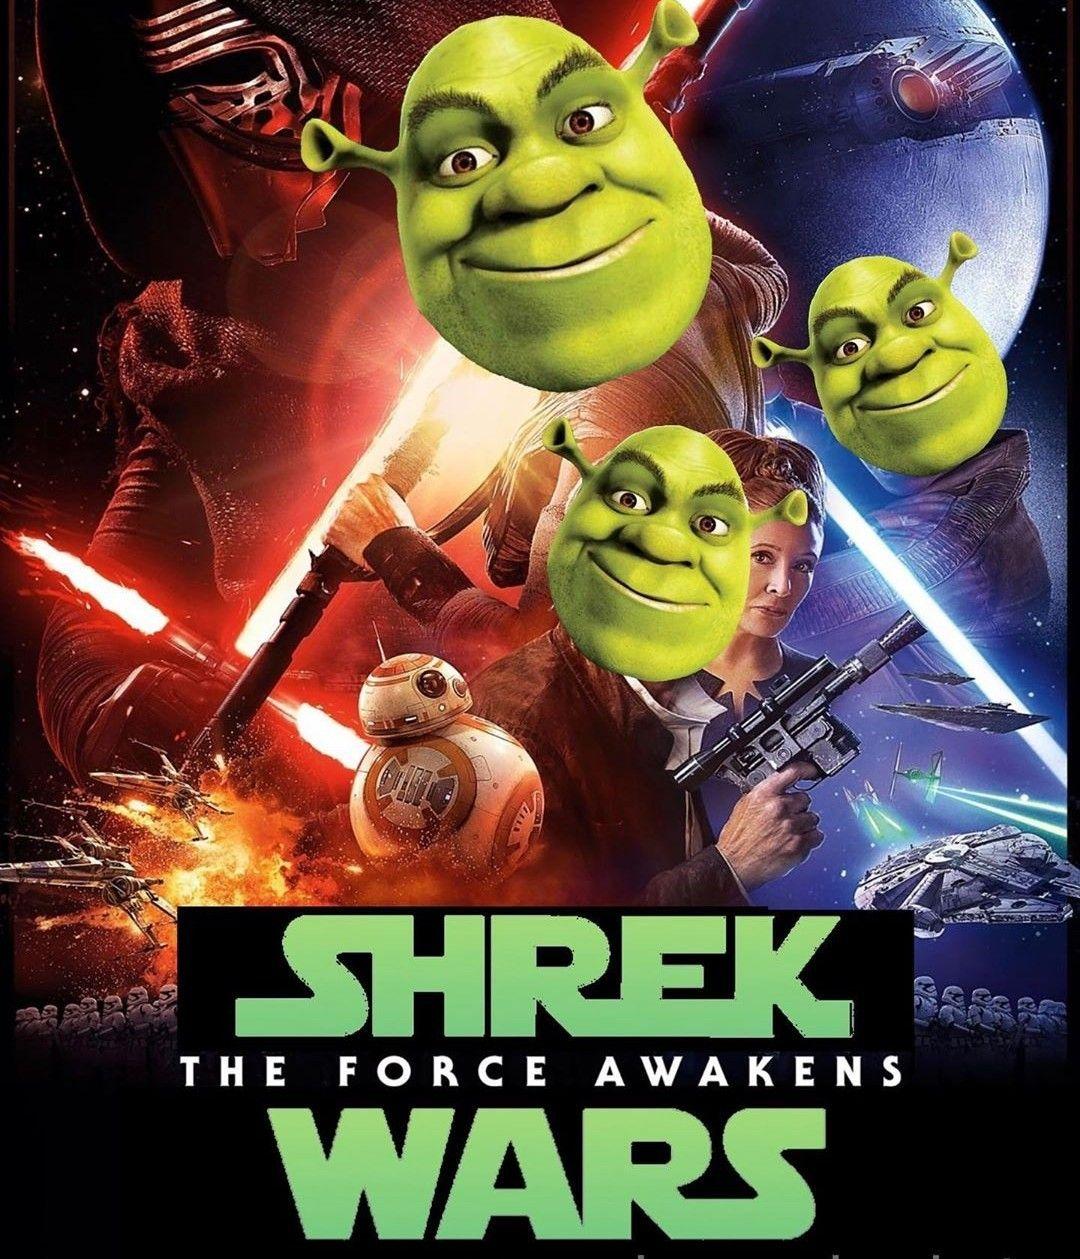 Pin By Shrexy On Shrek Shrek Memes Shrek Force Awakens